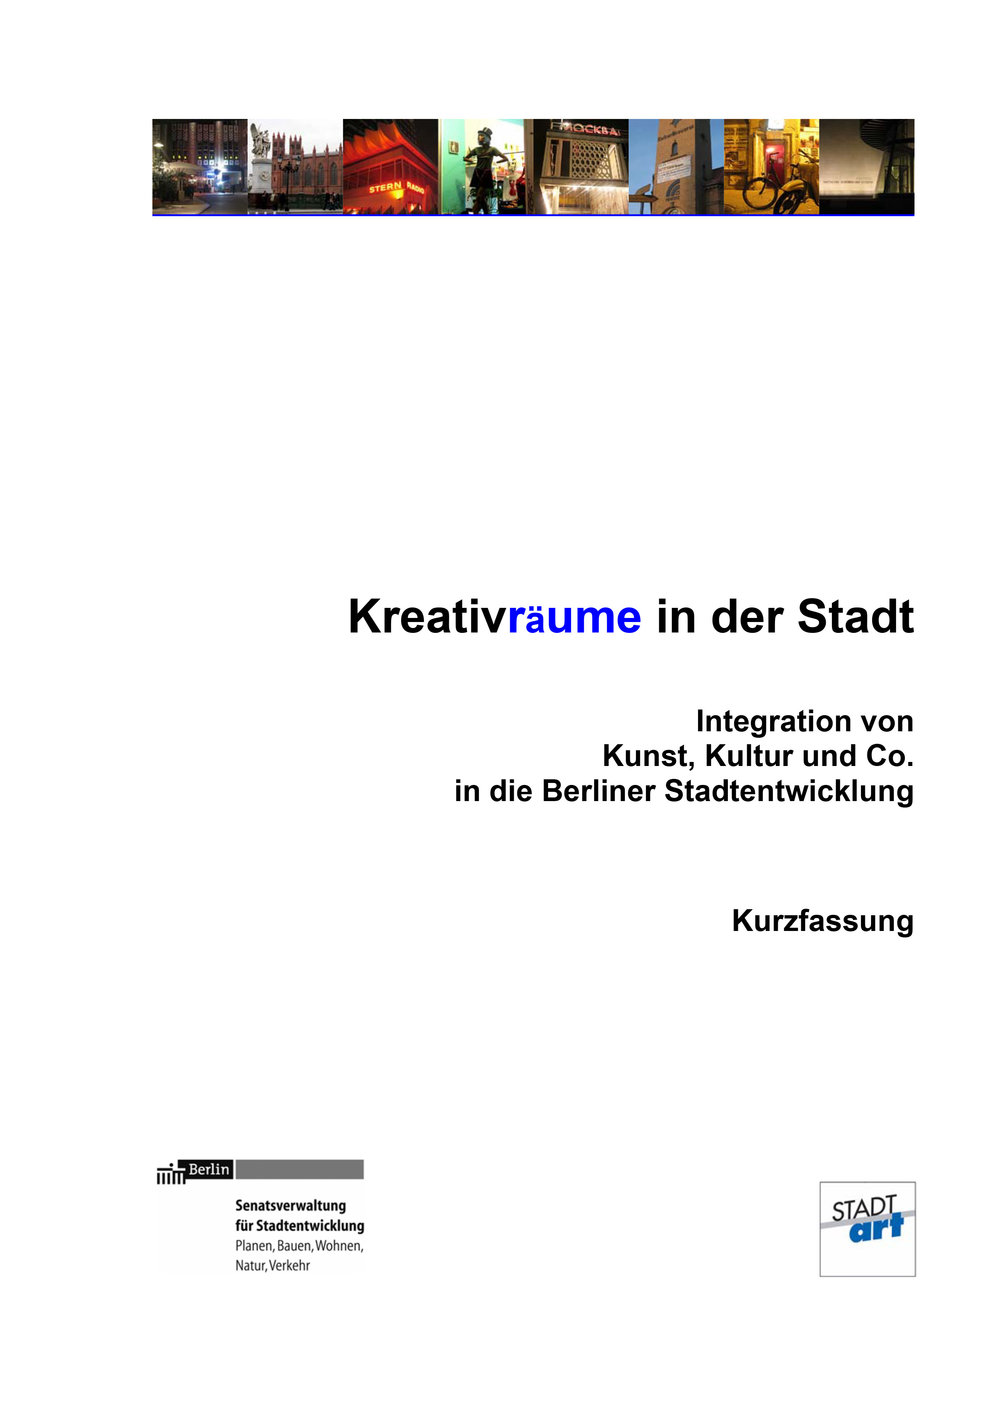 2008_DB_Dümcke_ARGE_Kreativräume Berlin.jpg